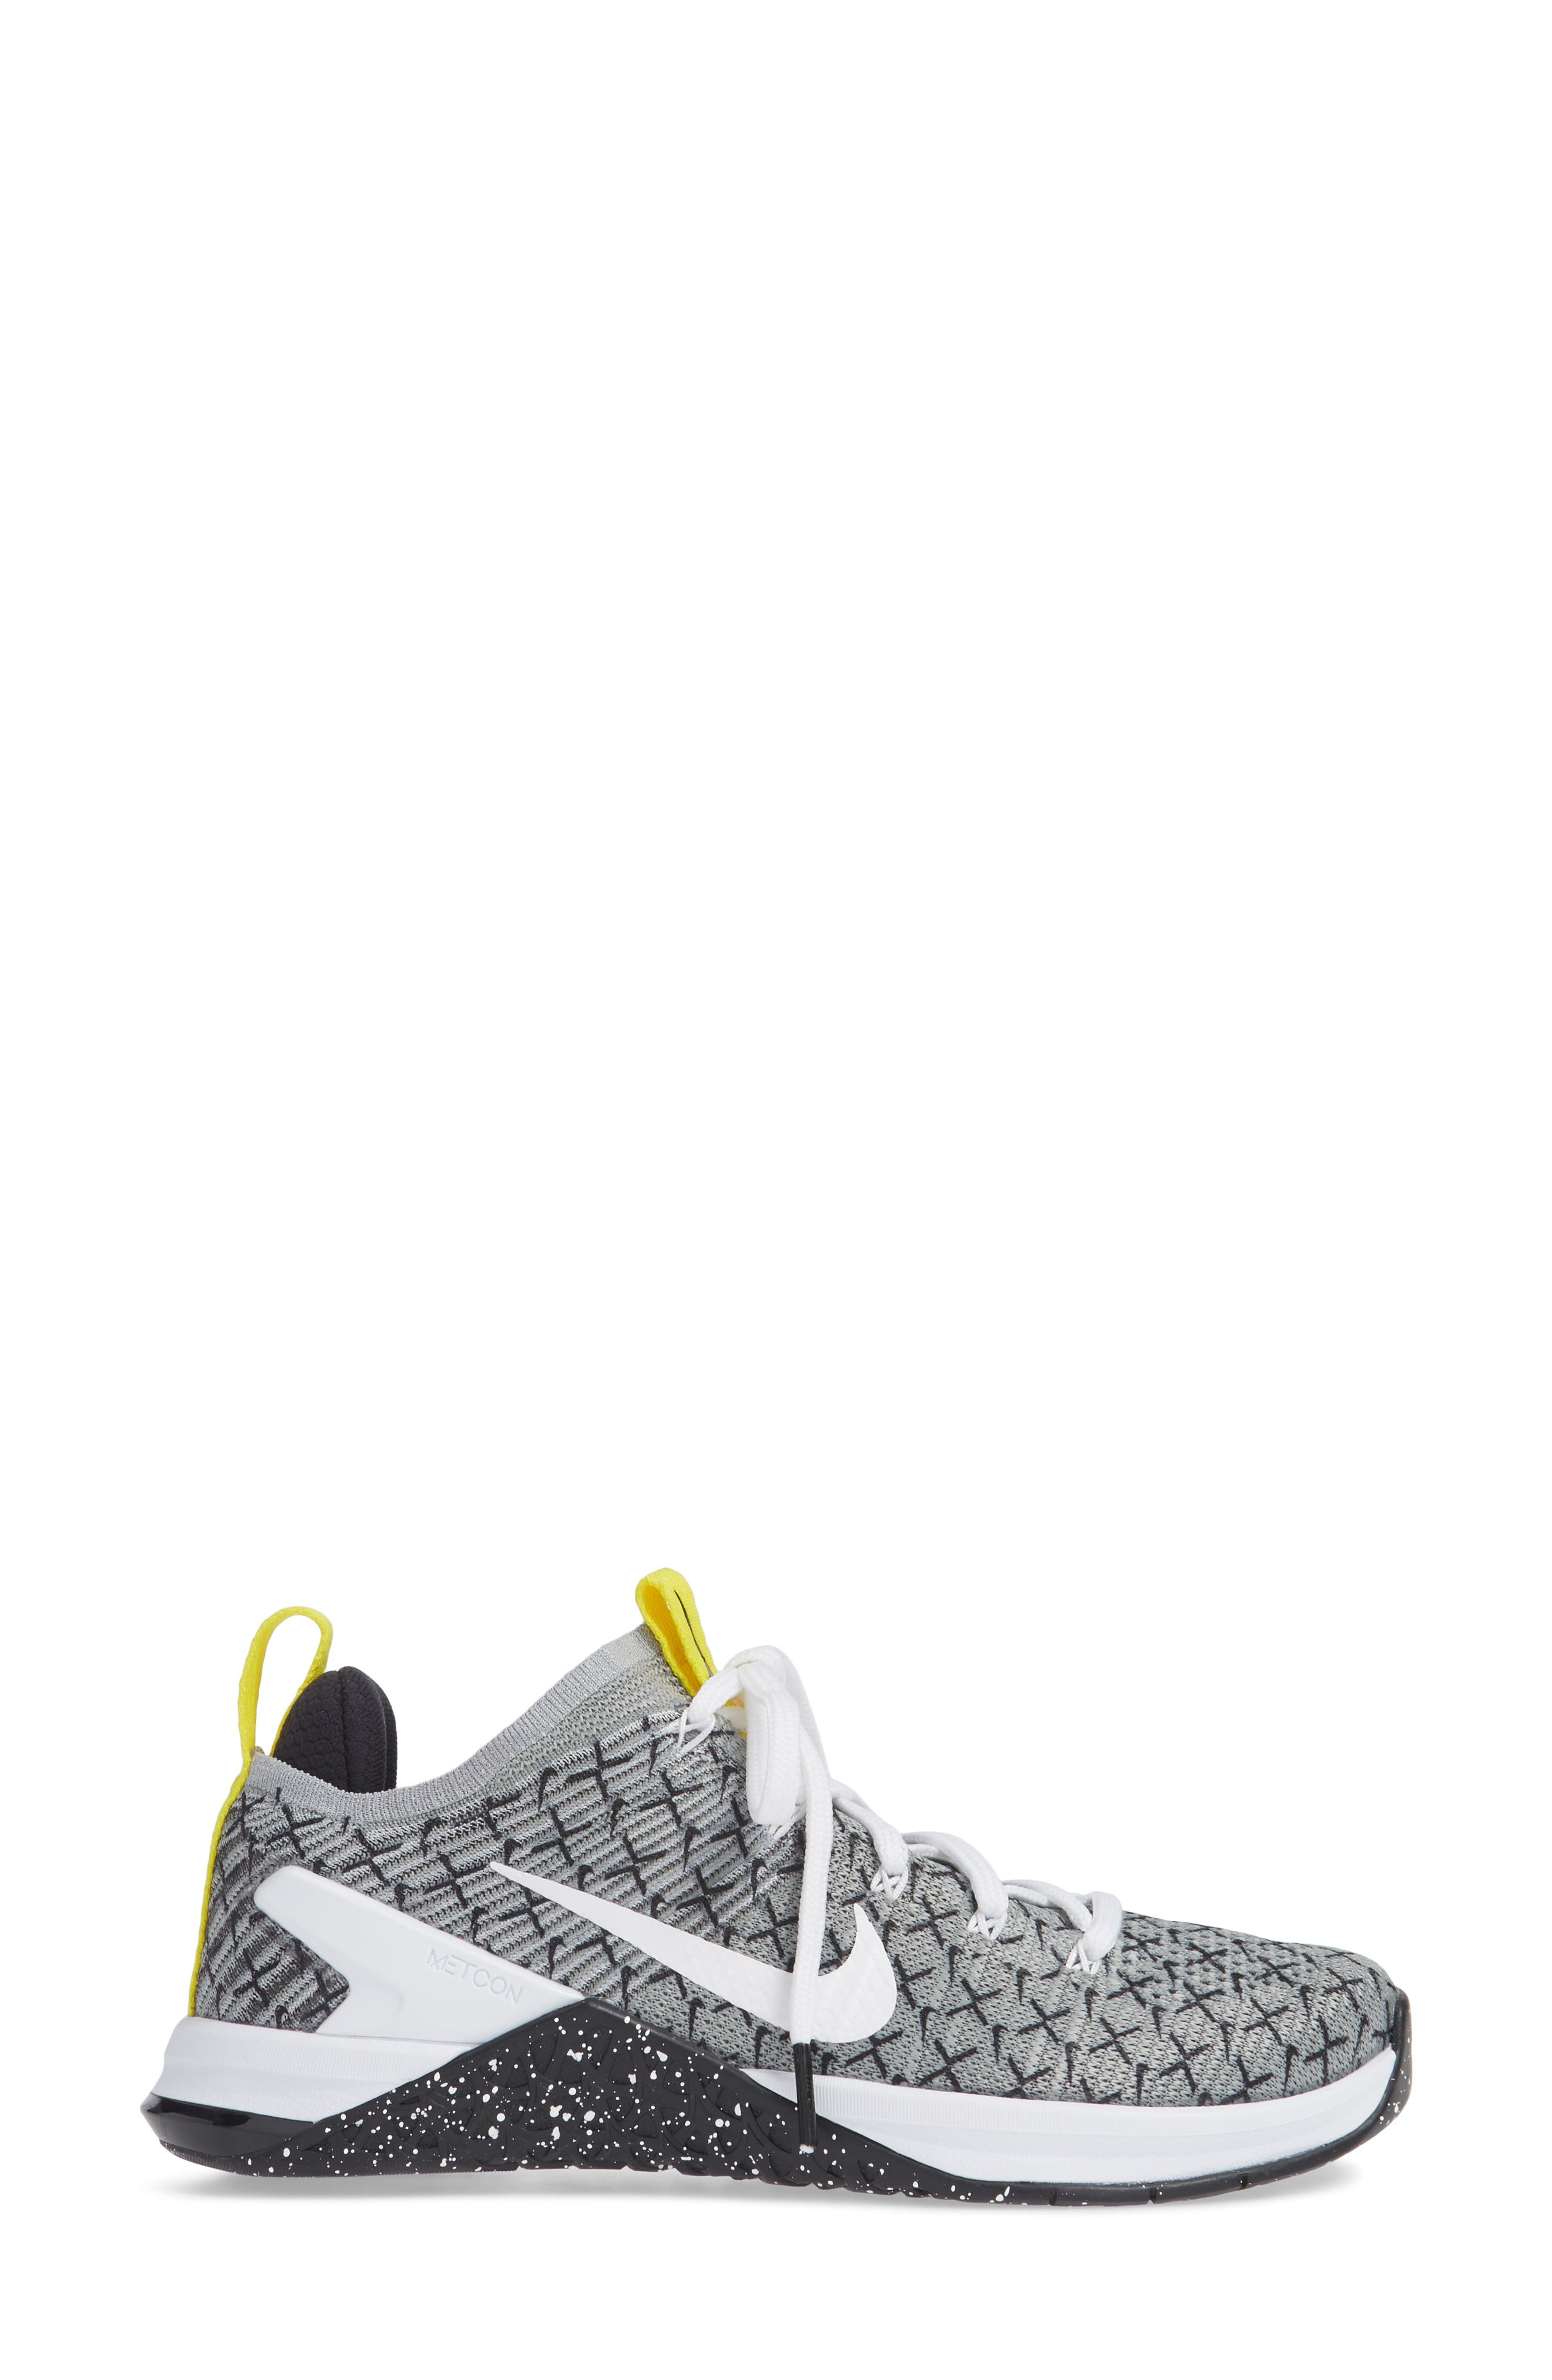 Metcon DSX Flyknit 2 Training Shoe,                             Alternate thumbnail 3, color,                             BLACK/ WHITE/ DYNAMIC YELLOW